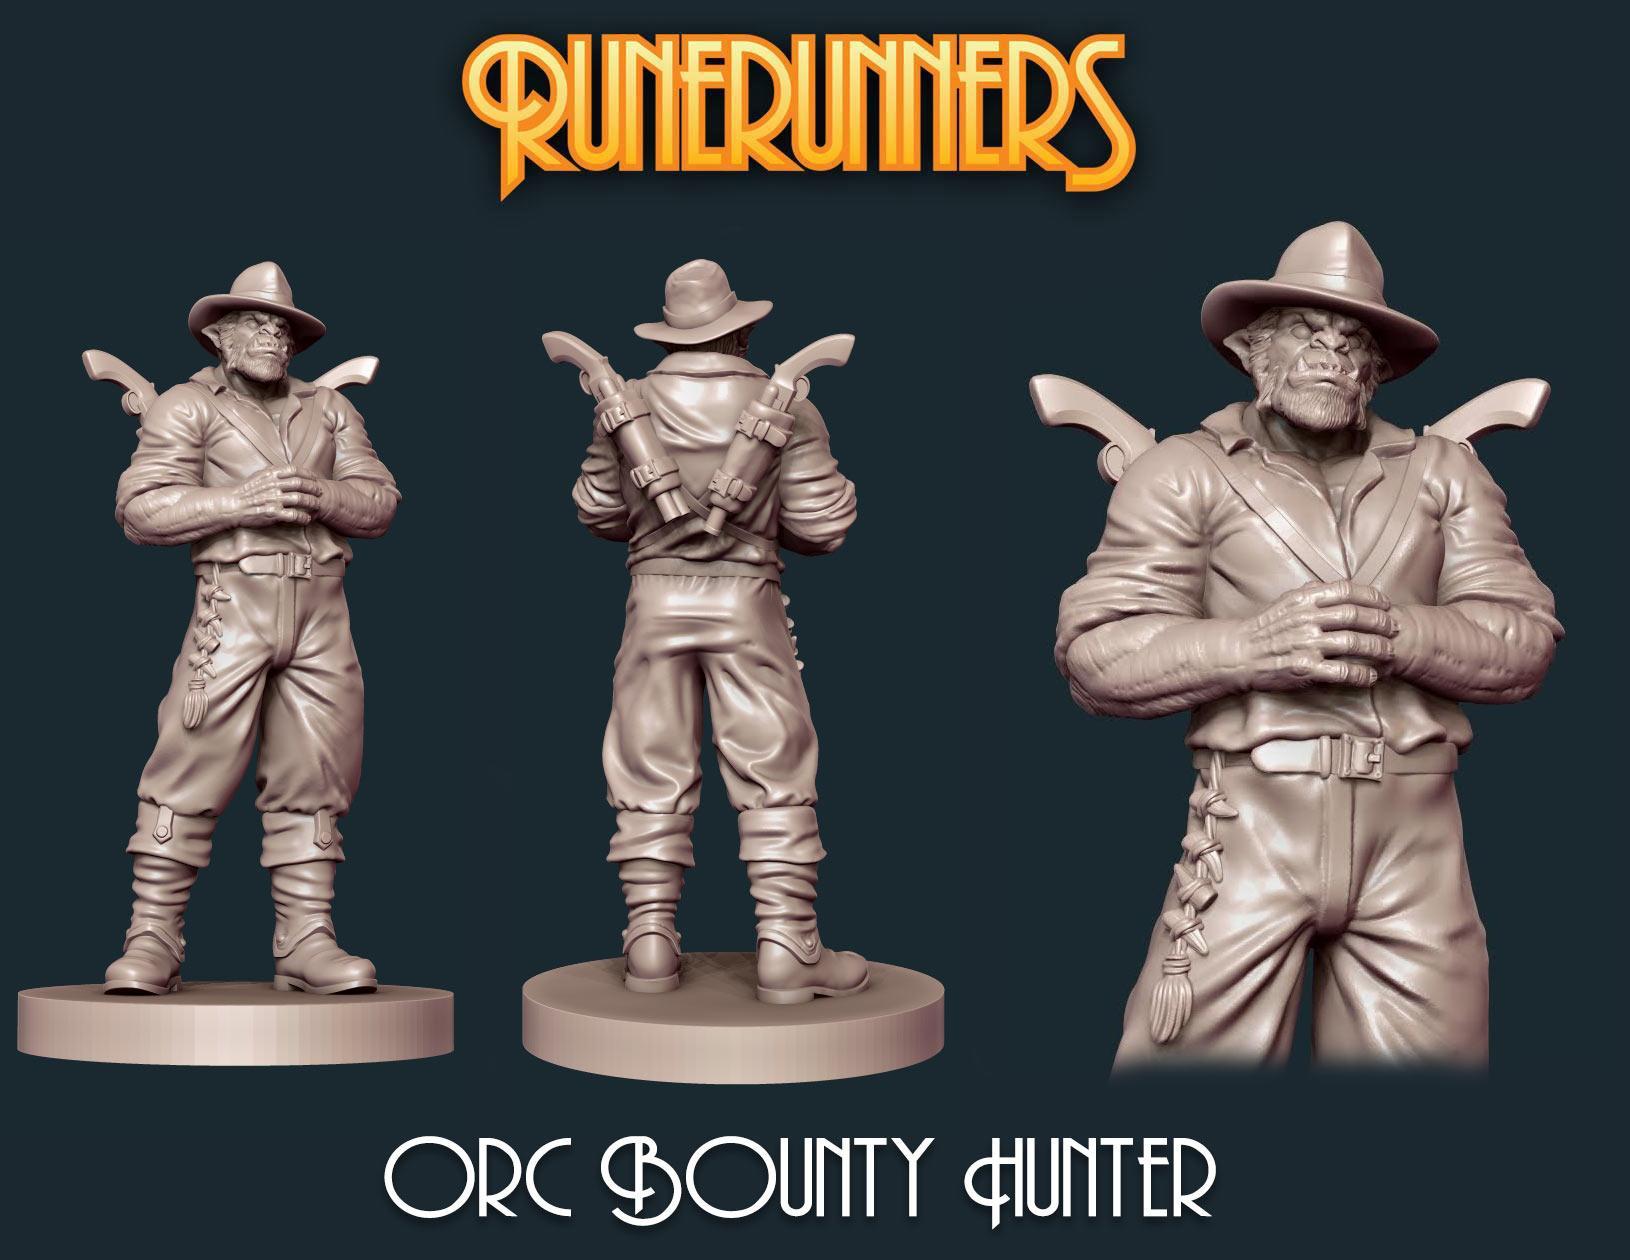 Orc Bounty Hunter